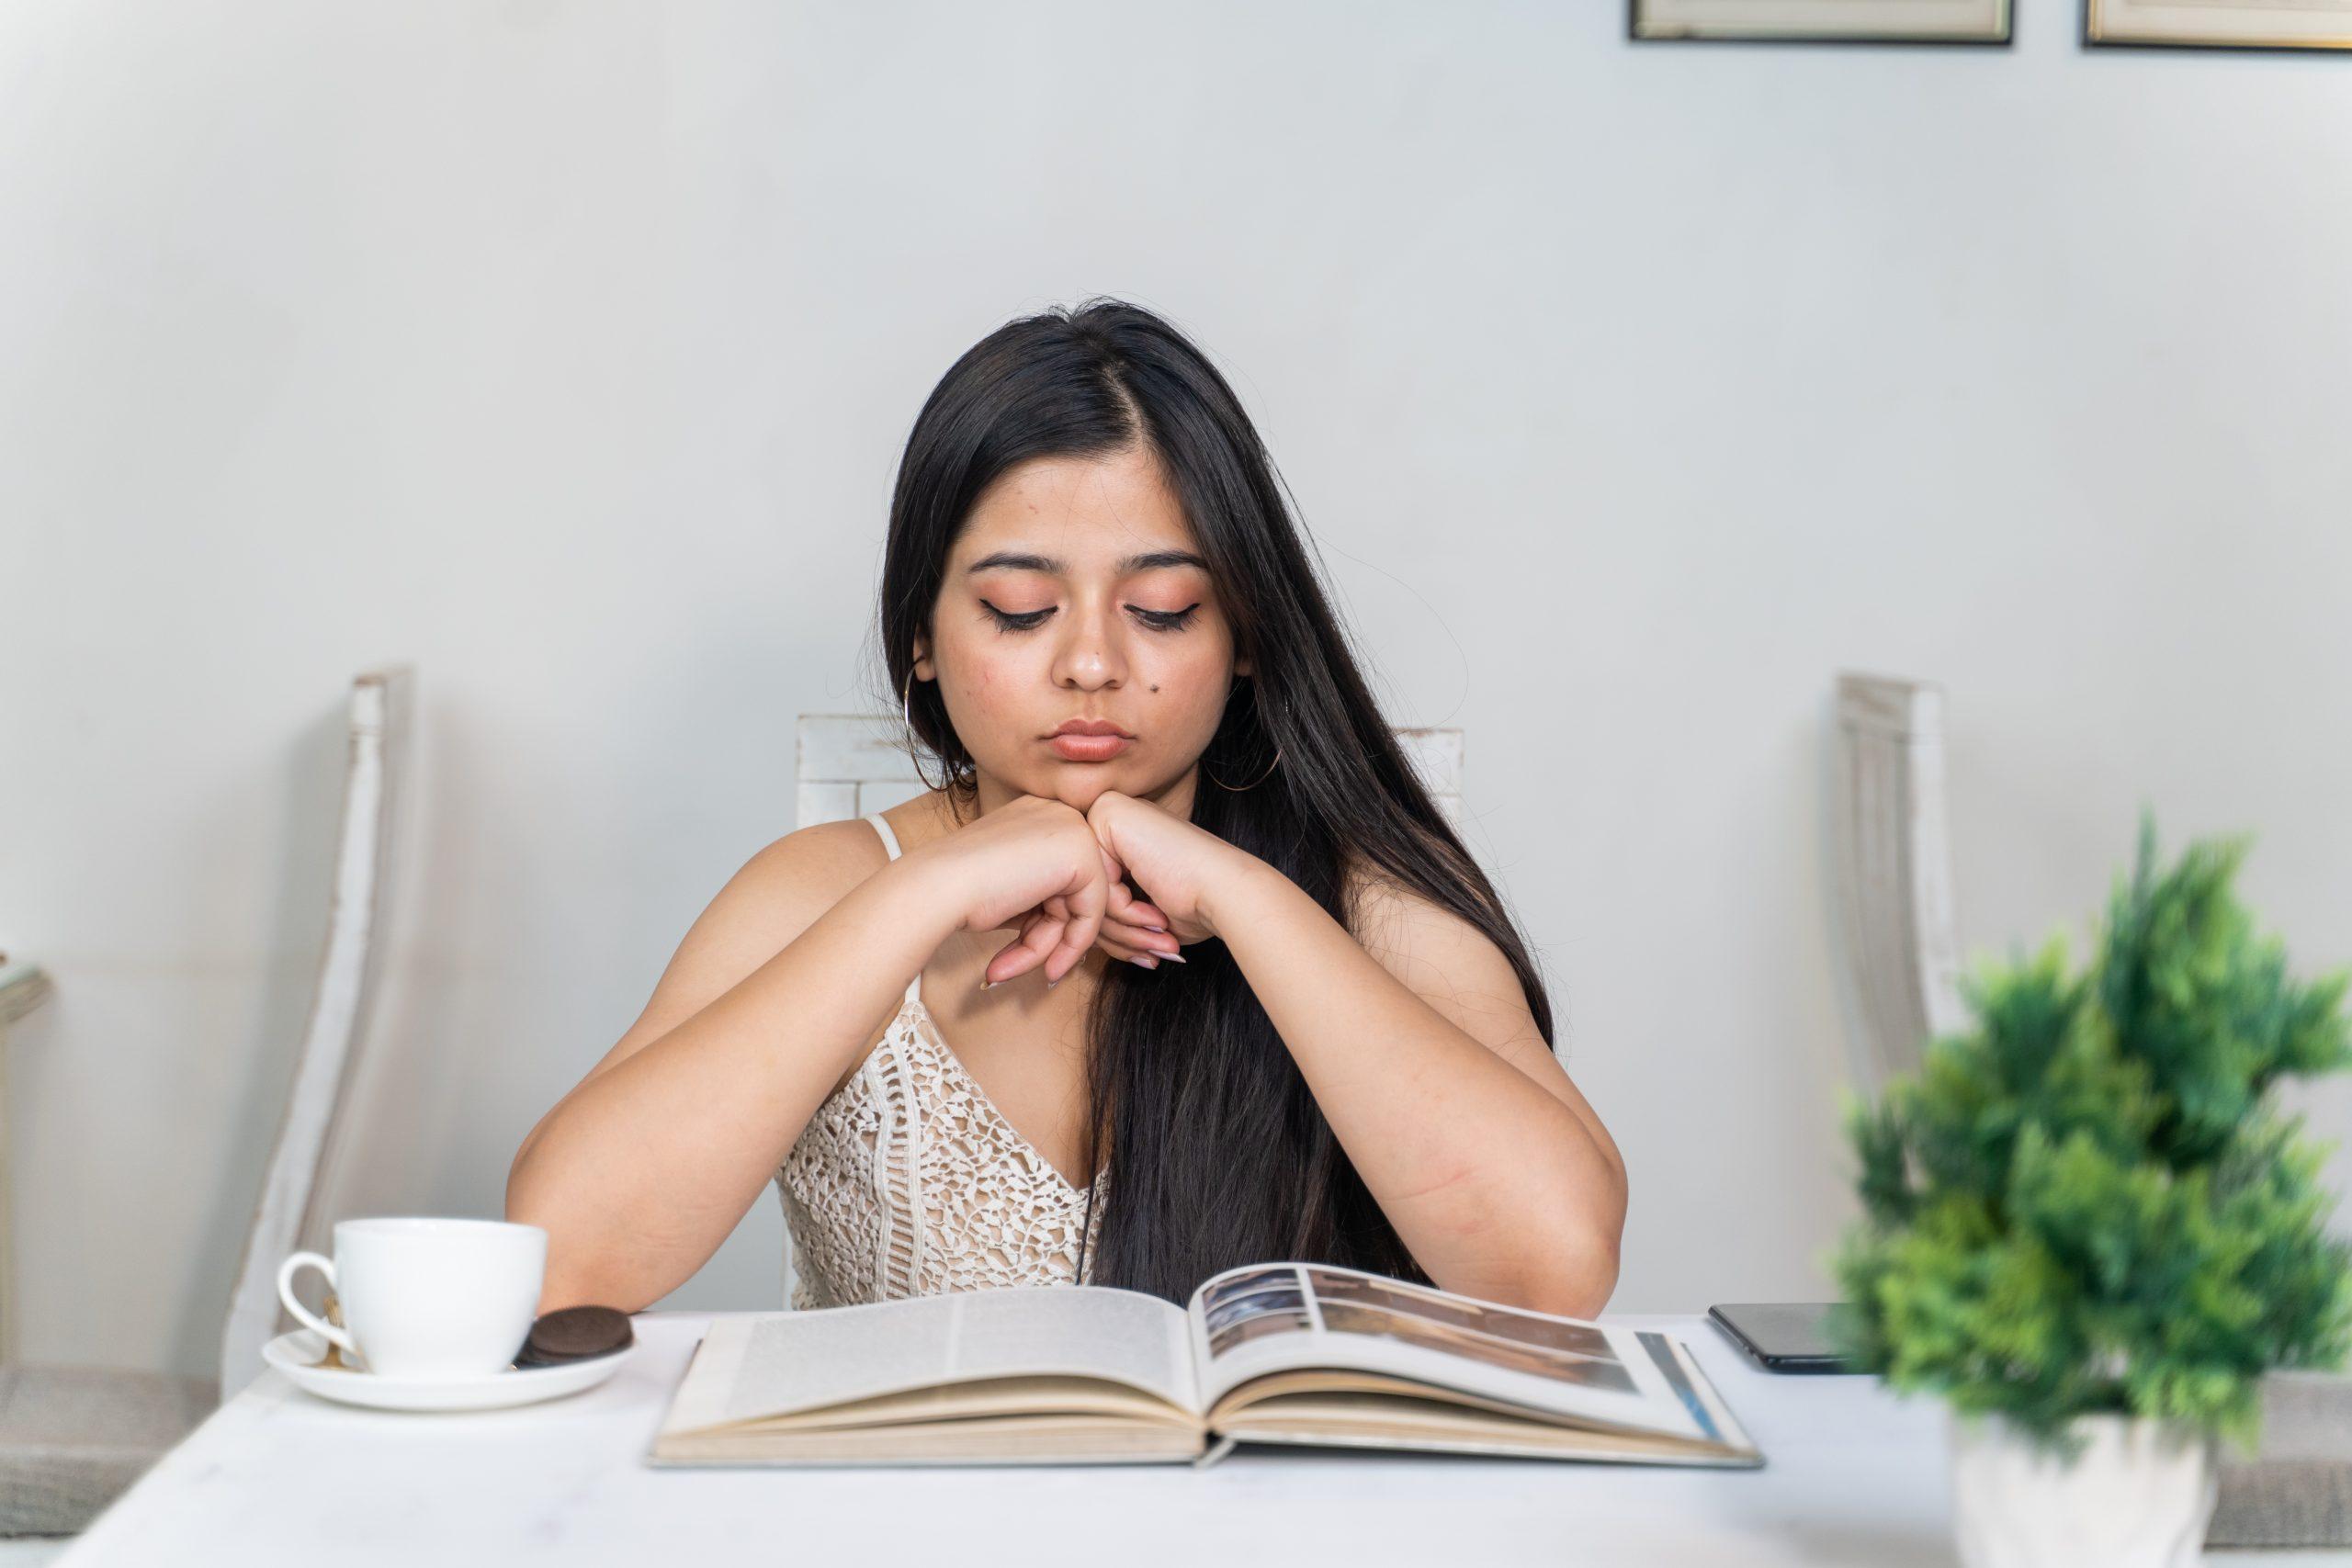 Girl reading book in cafe